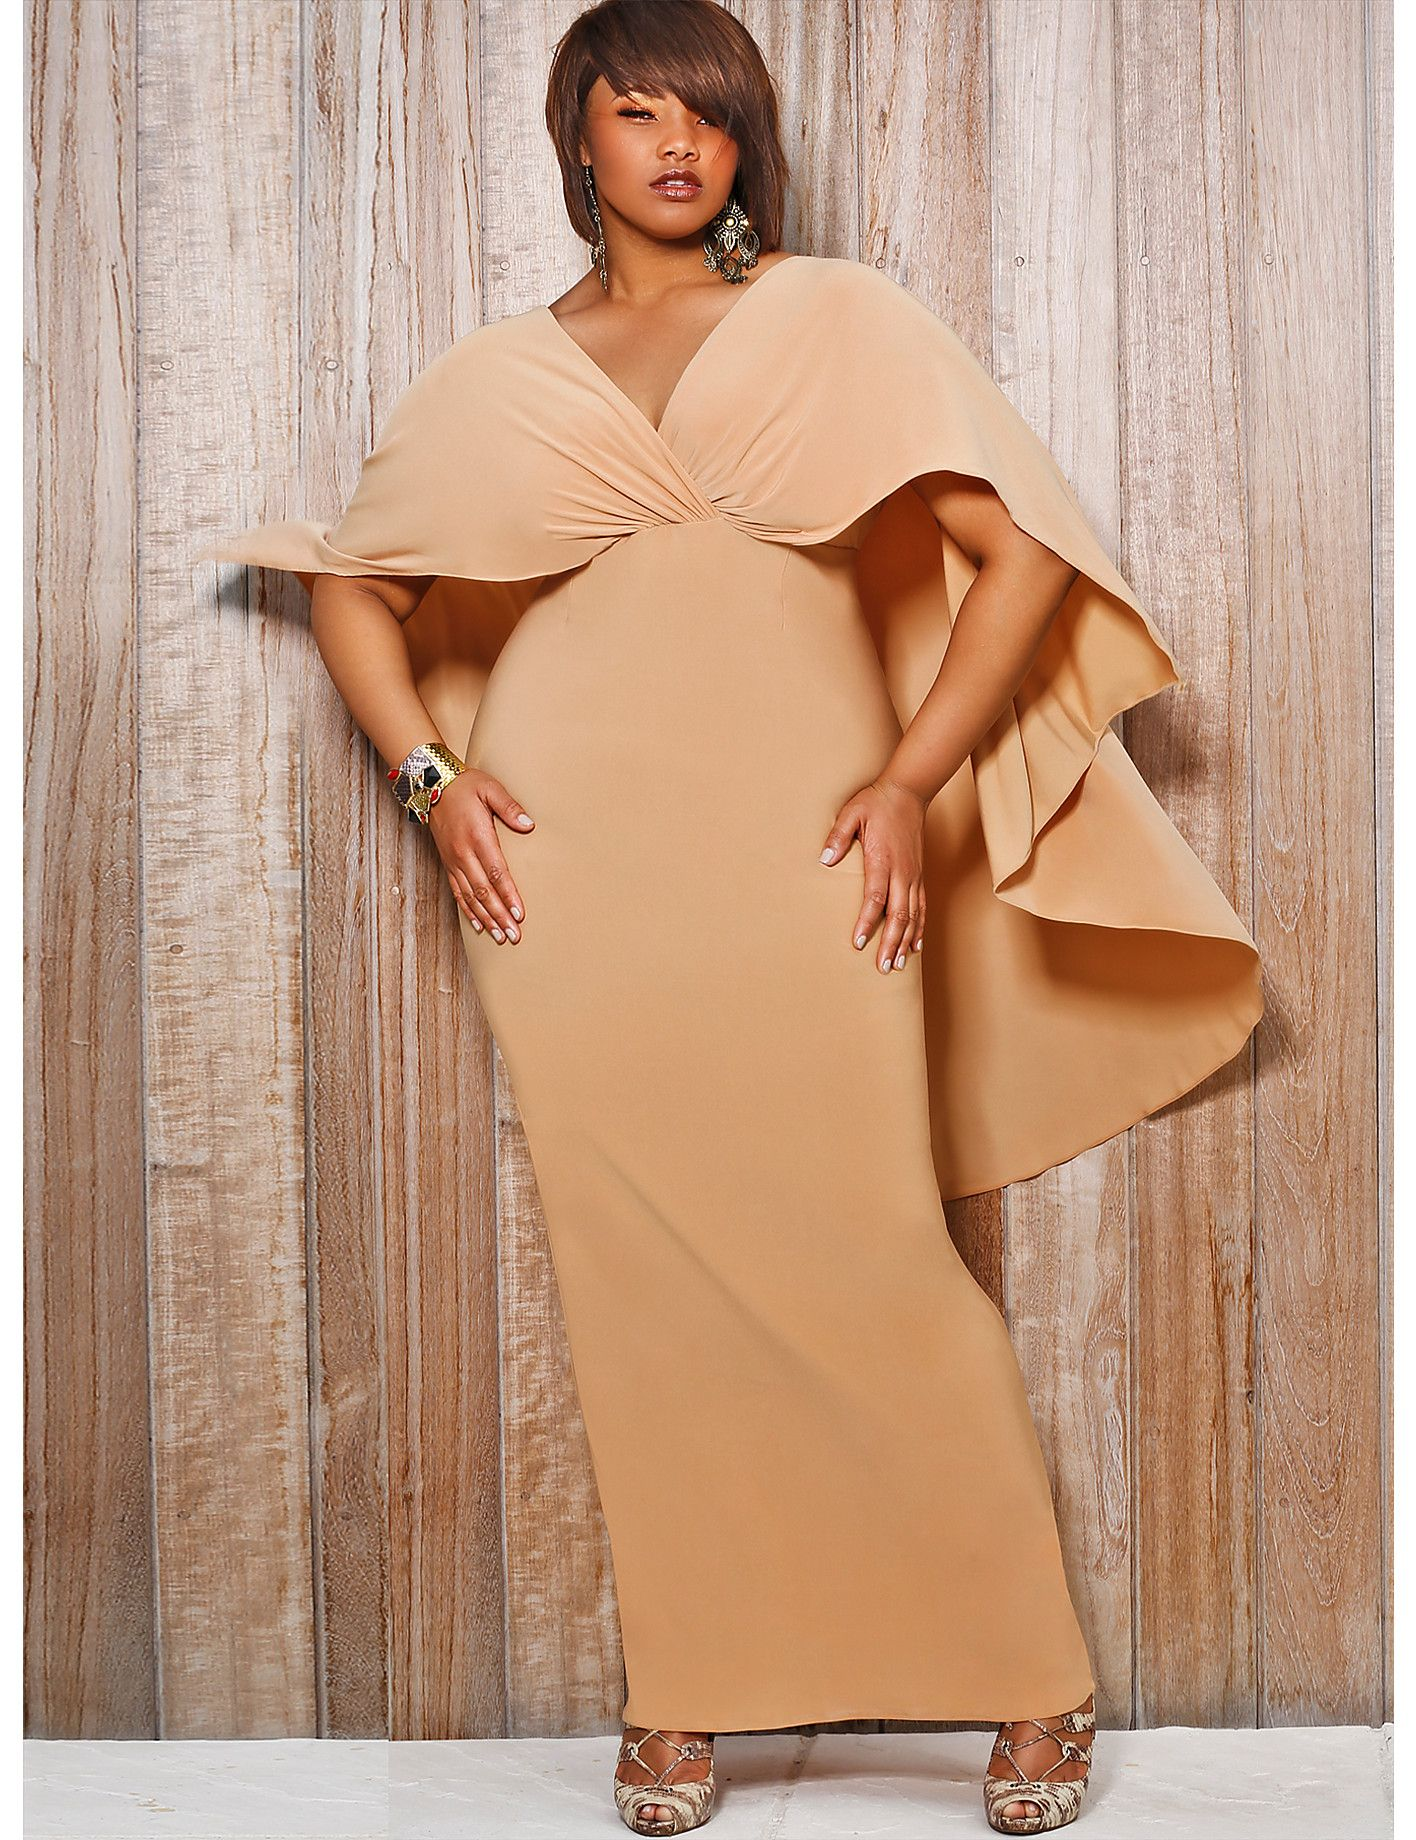 The bridgette capeback maxi dress is available for sale now but